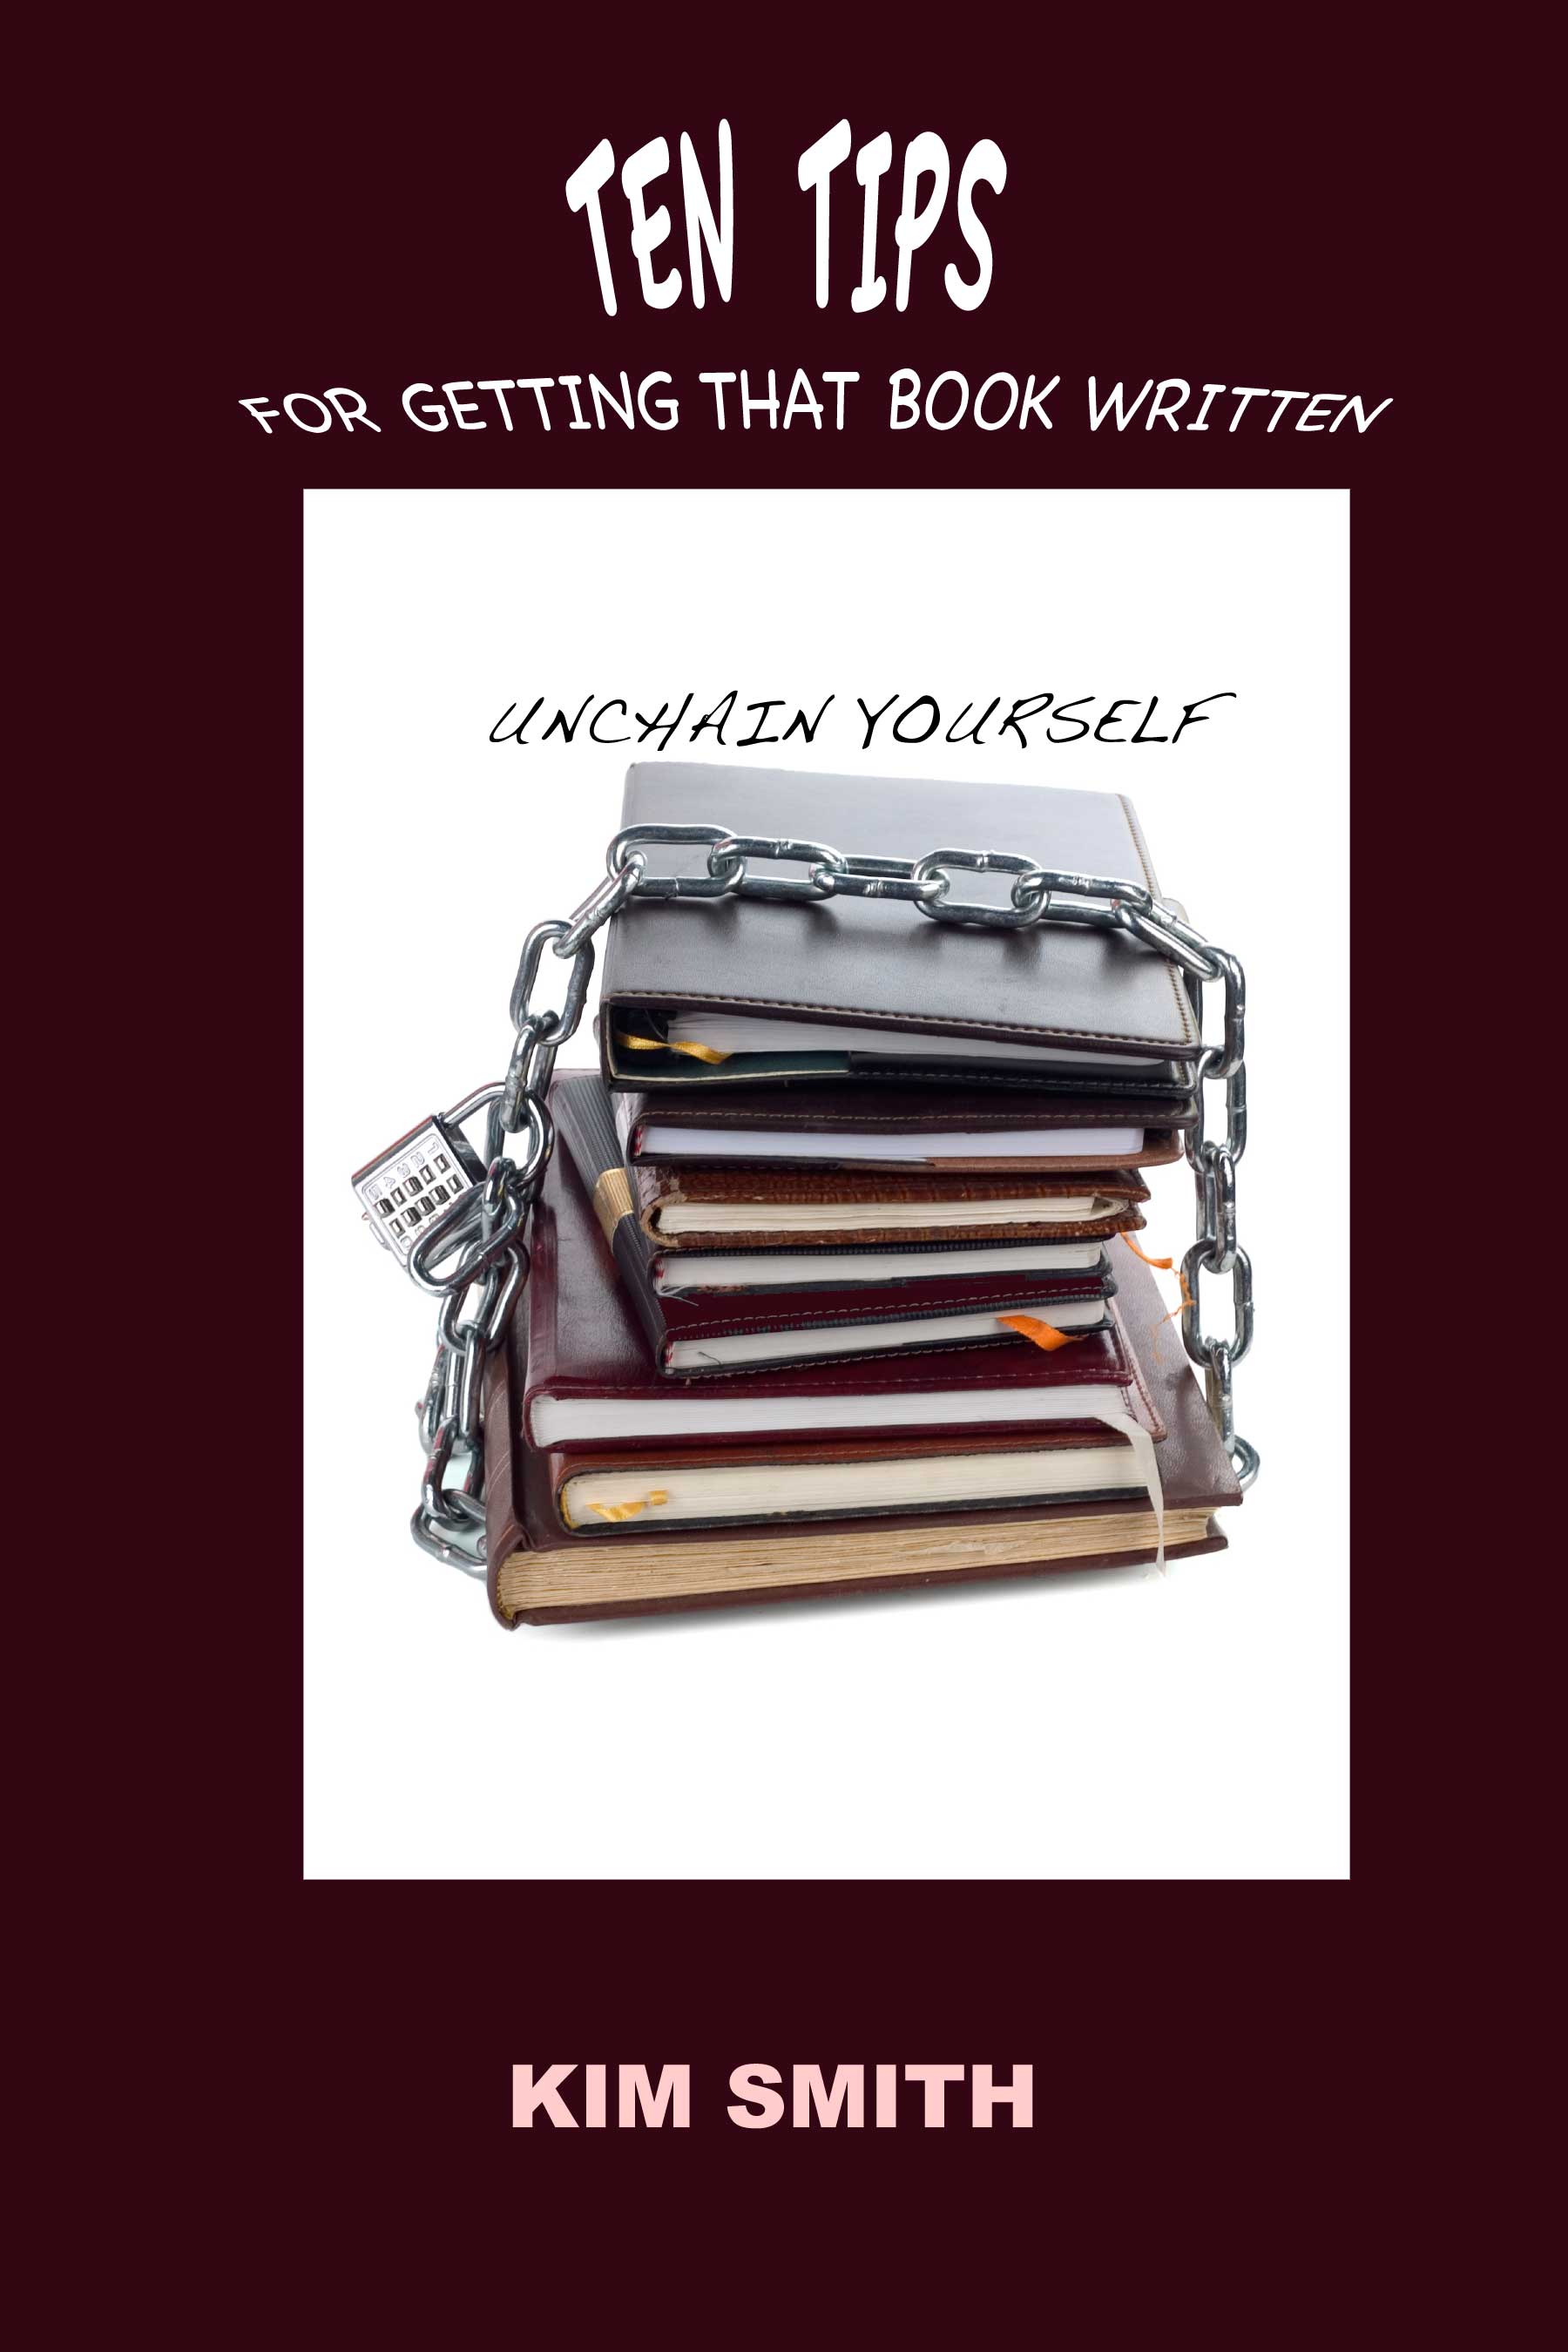 Ten Tips for Getting that Book Written